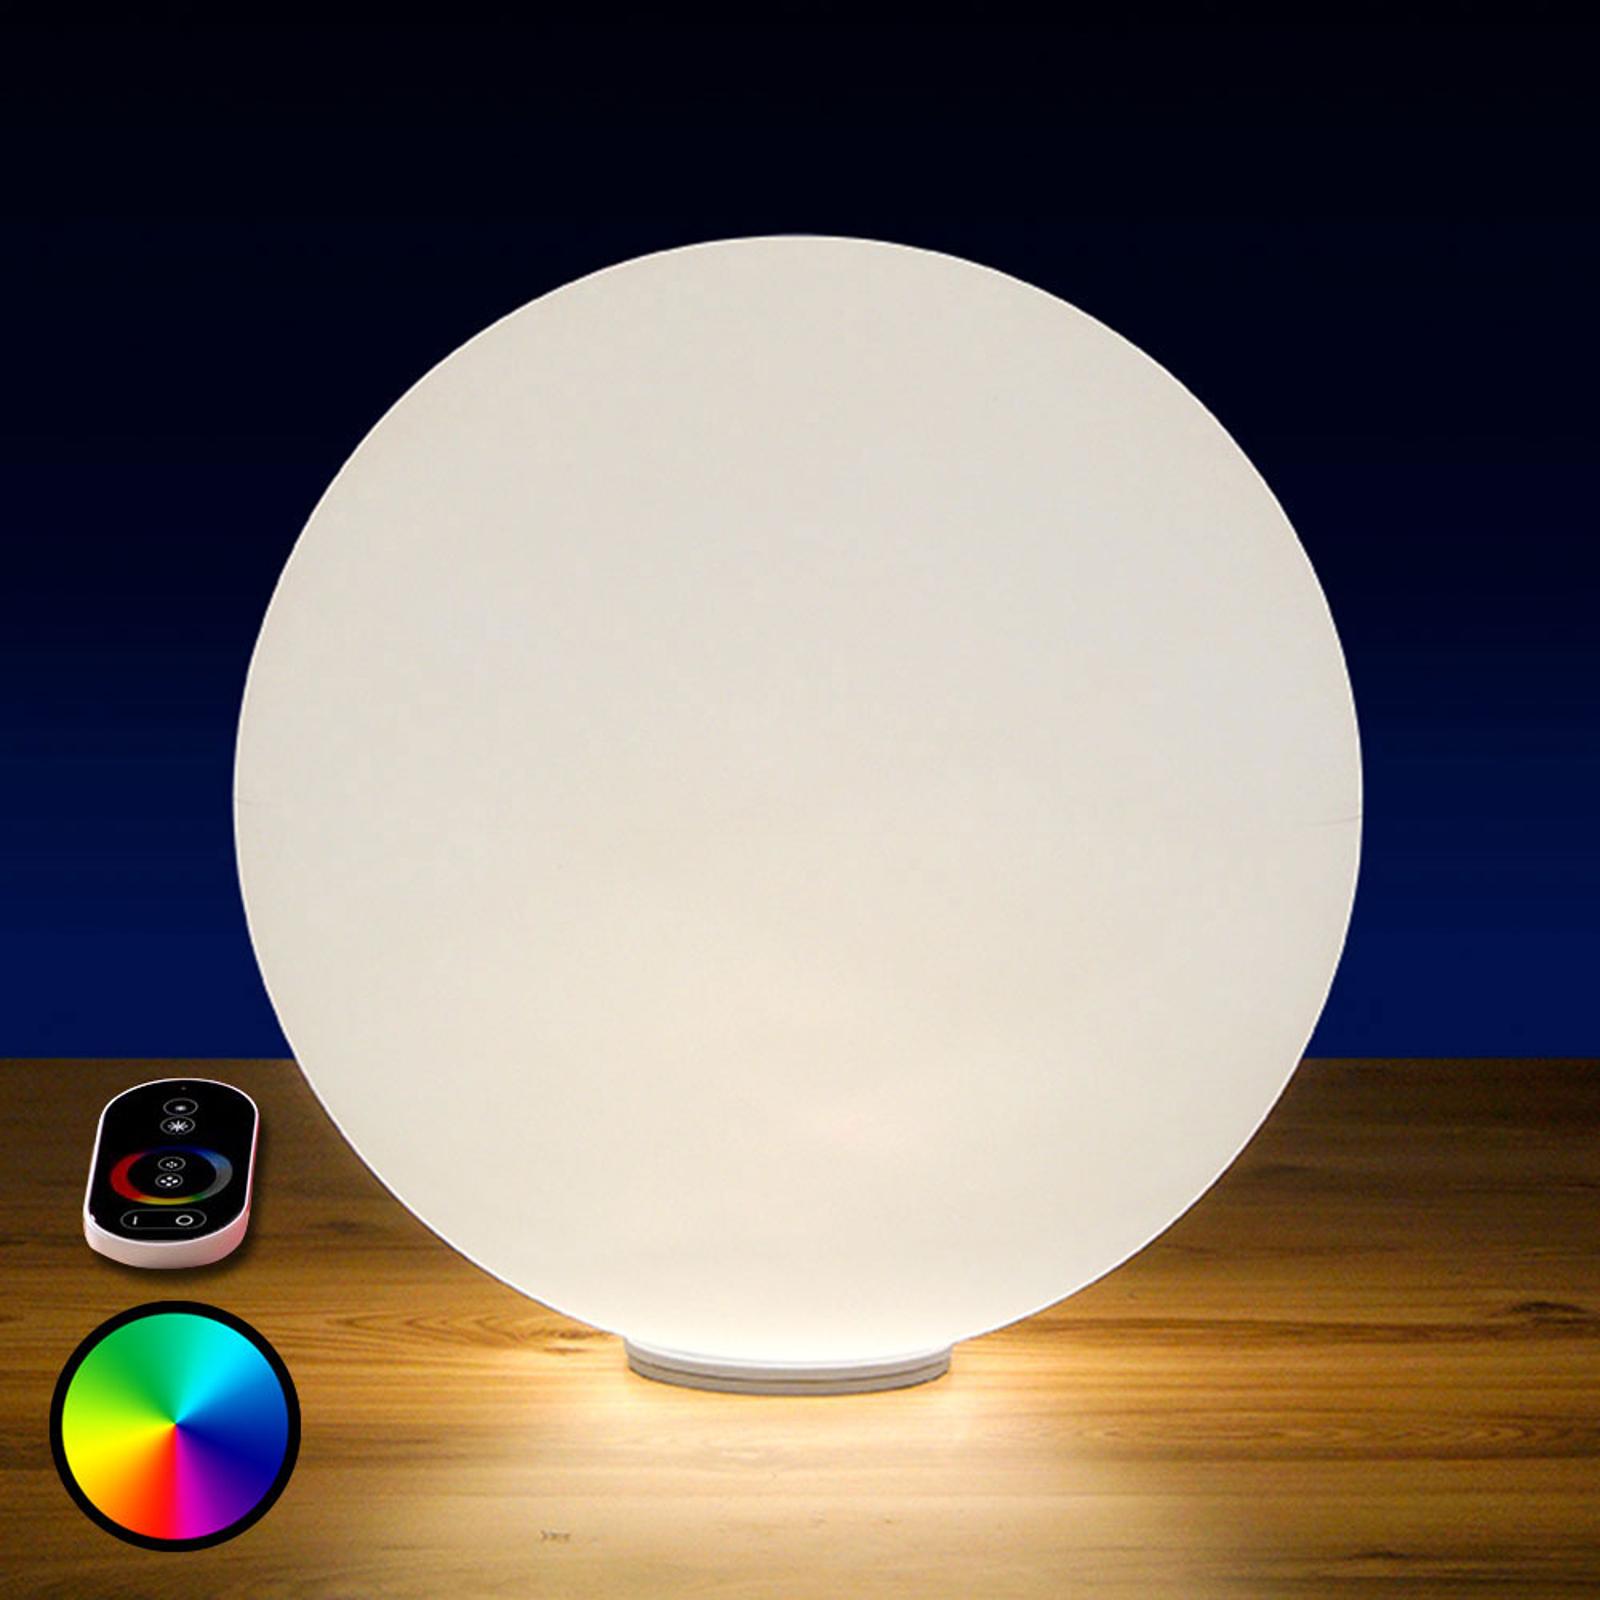 RGB LED koule Snowball venkovní s baterií, 30 cm